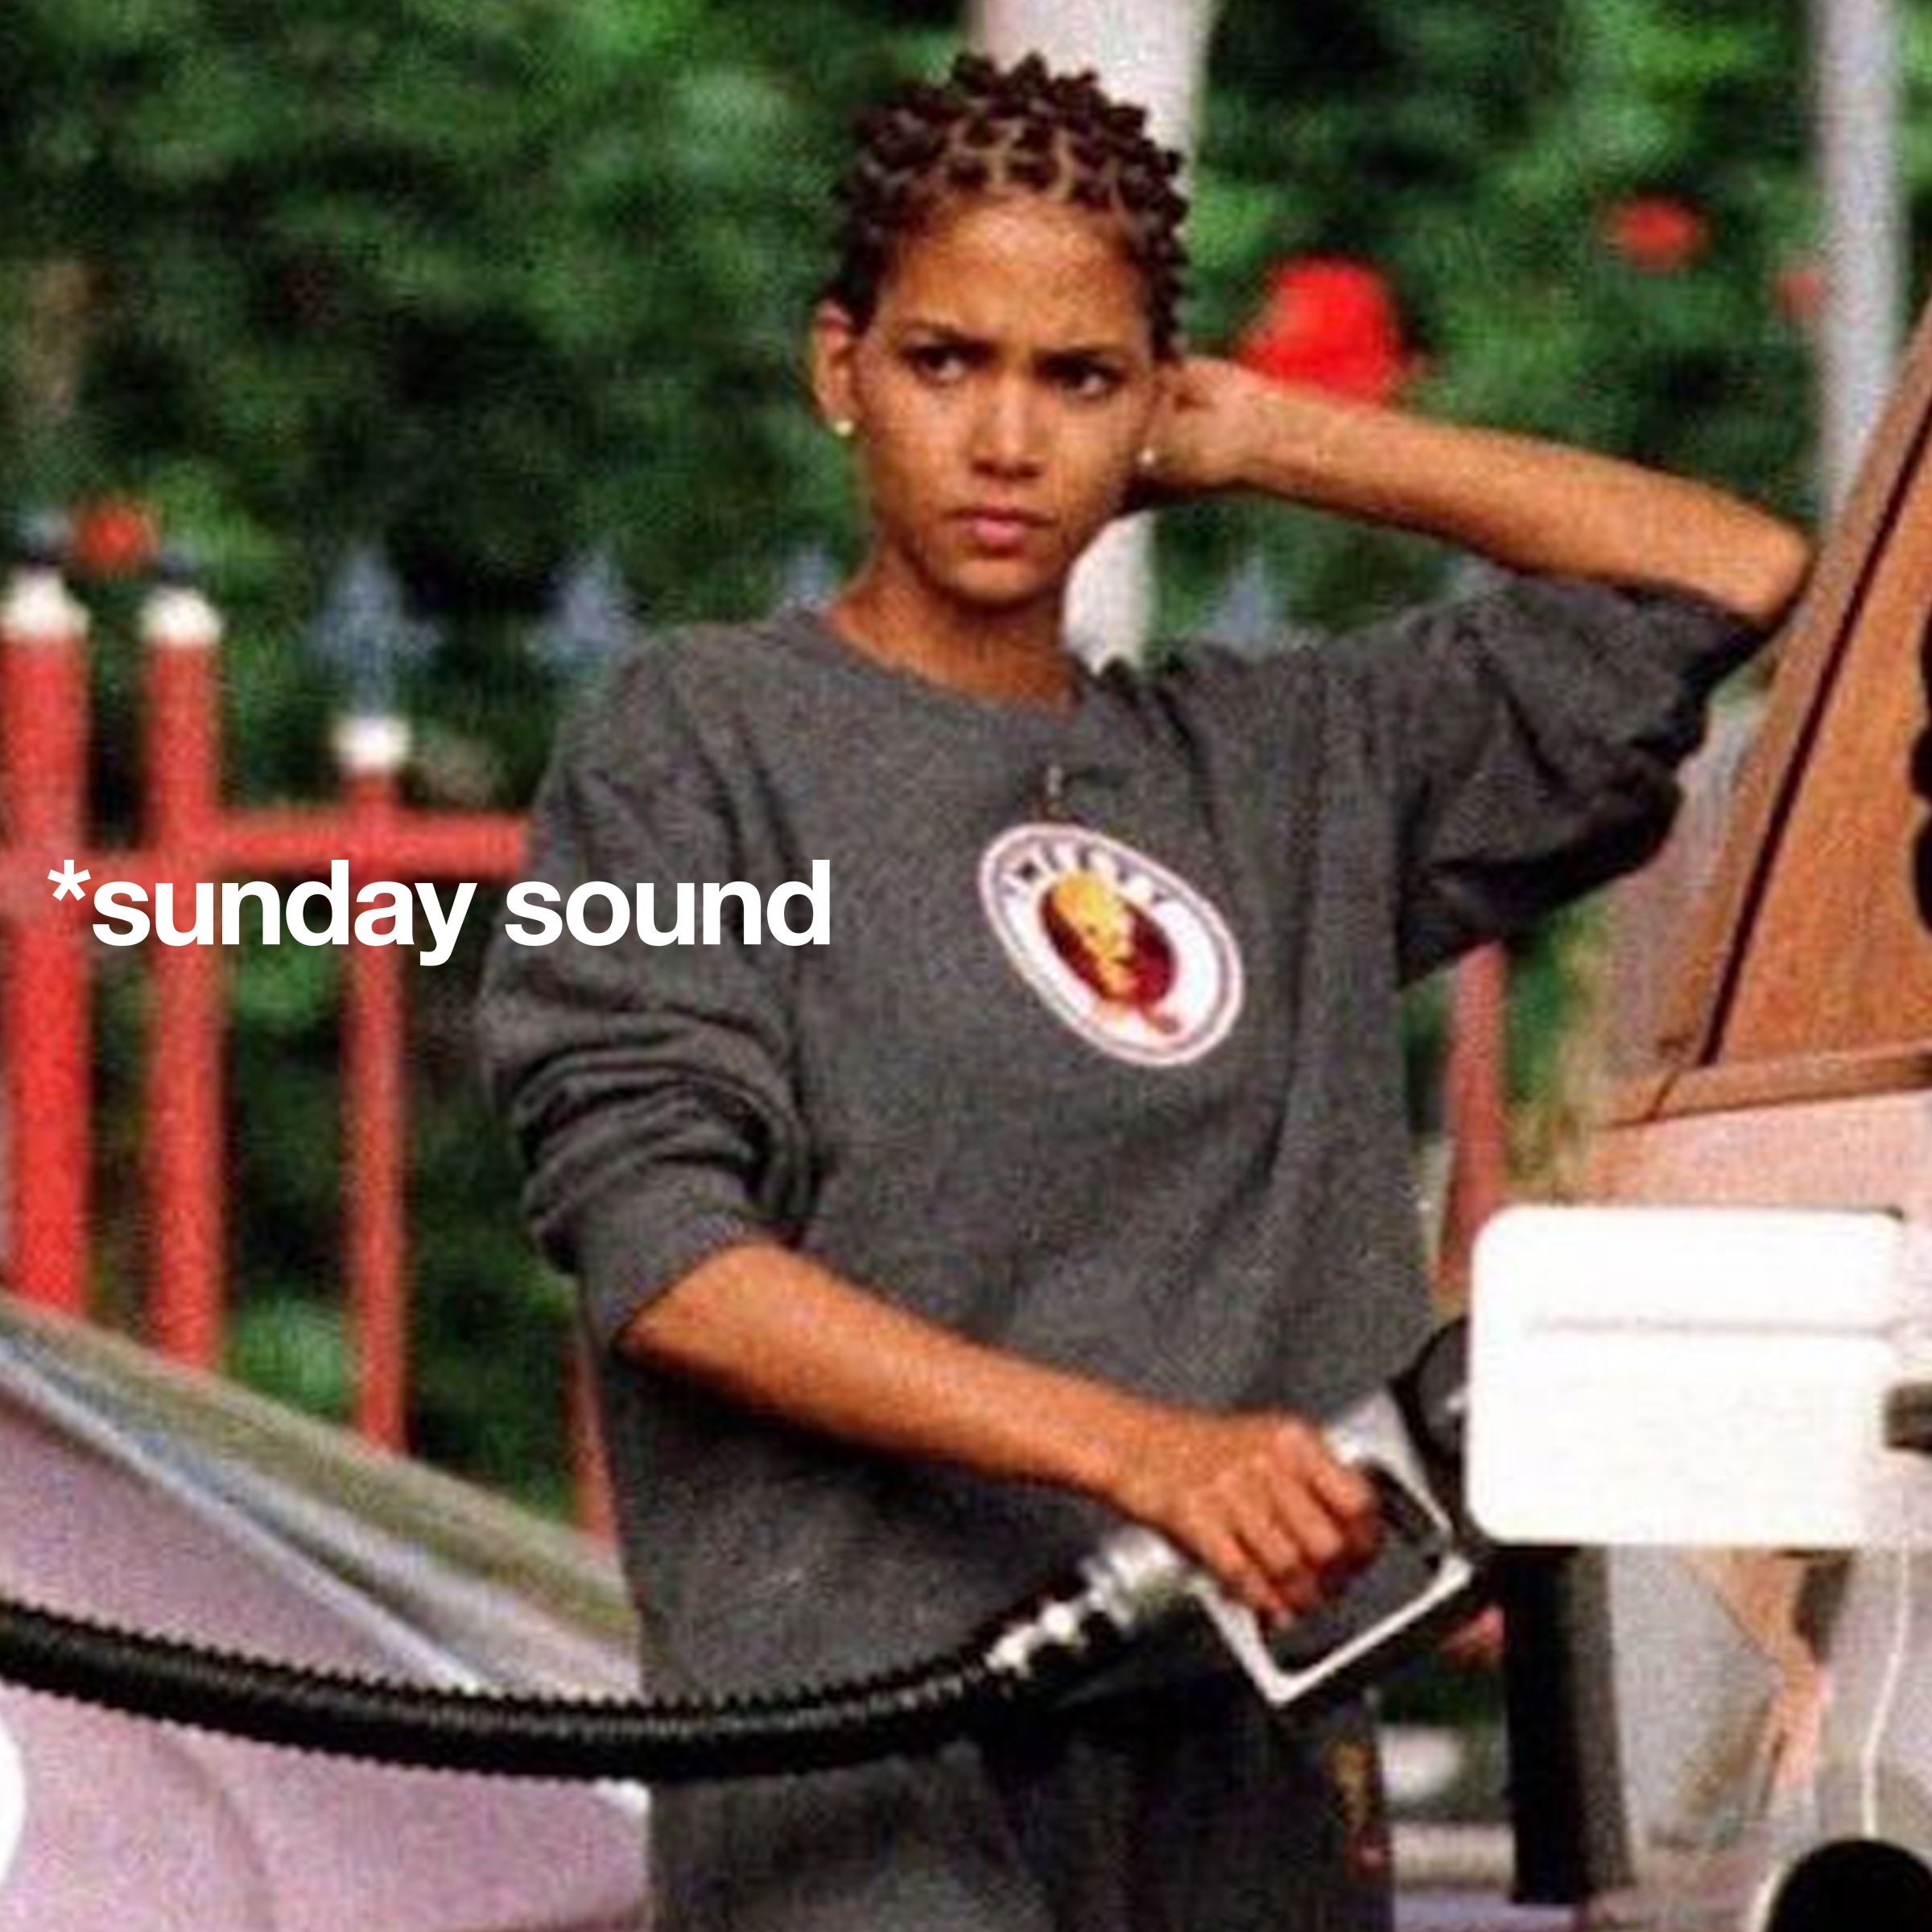 SUNDAY SOUND1.jpg